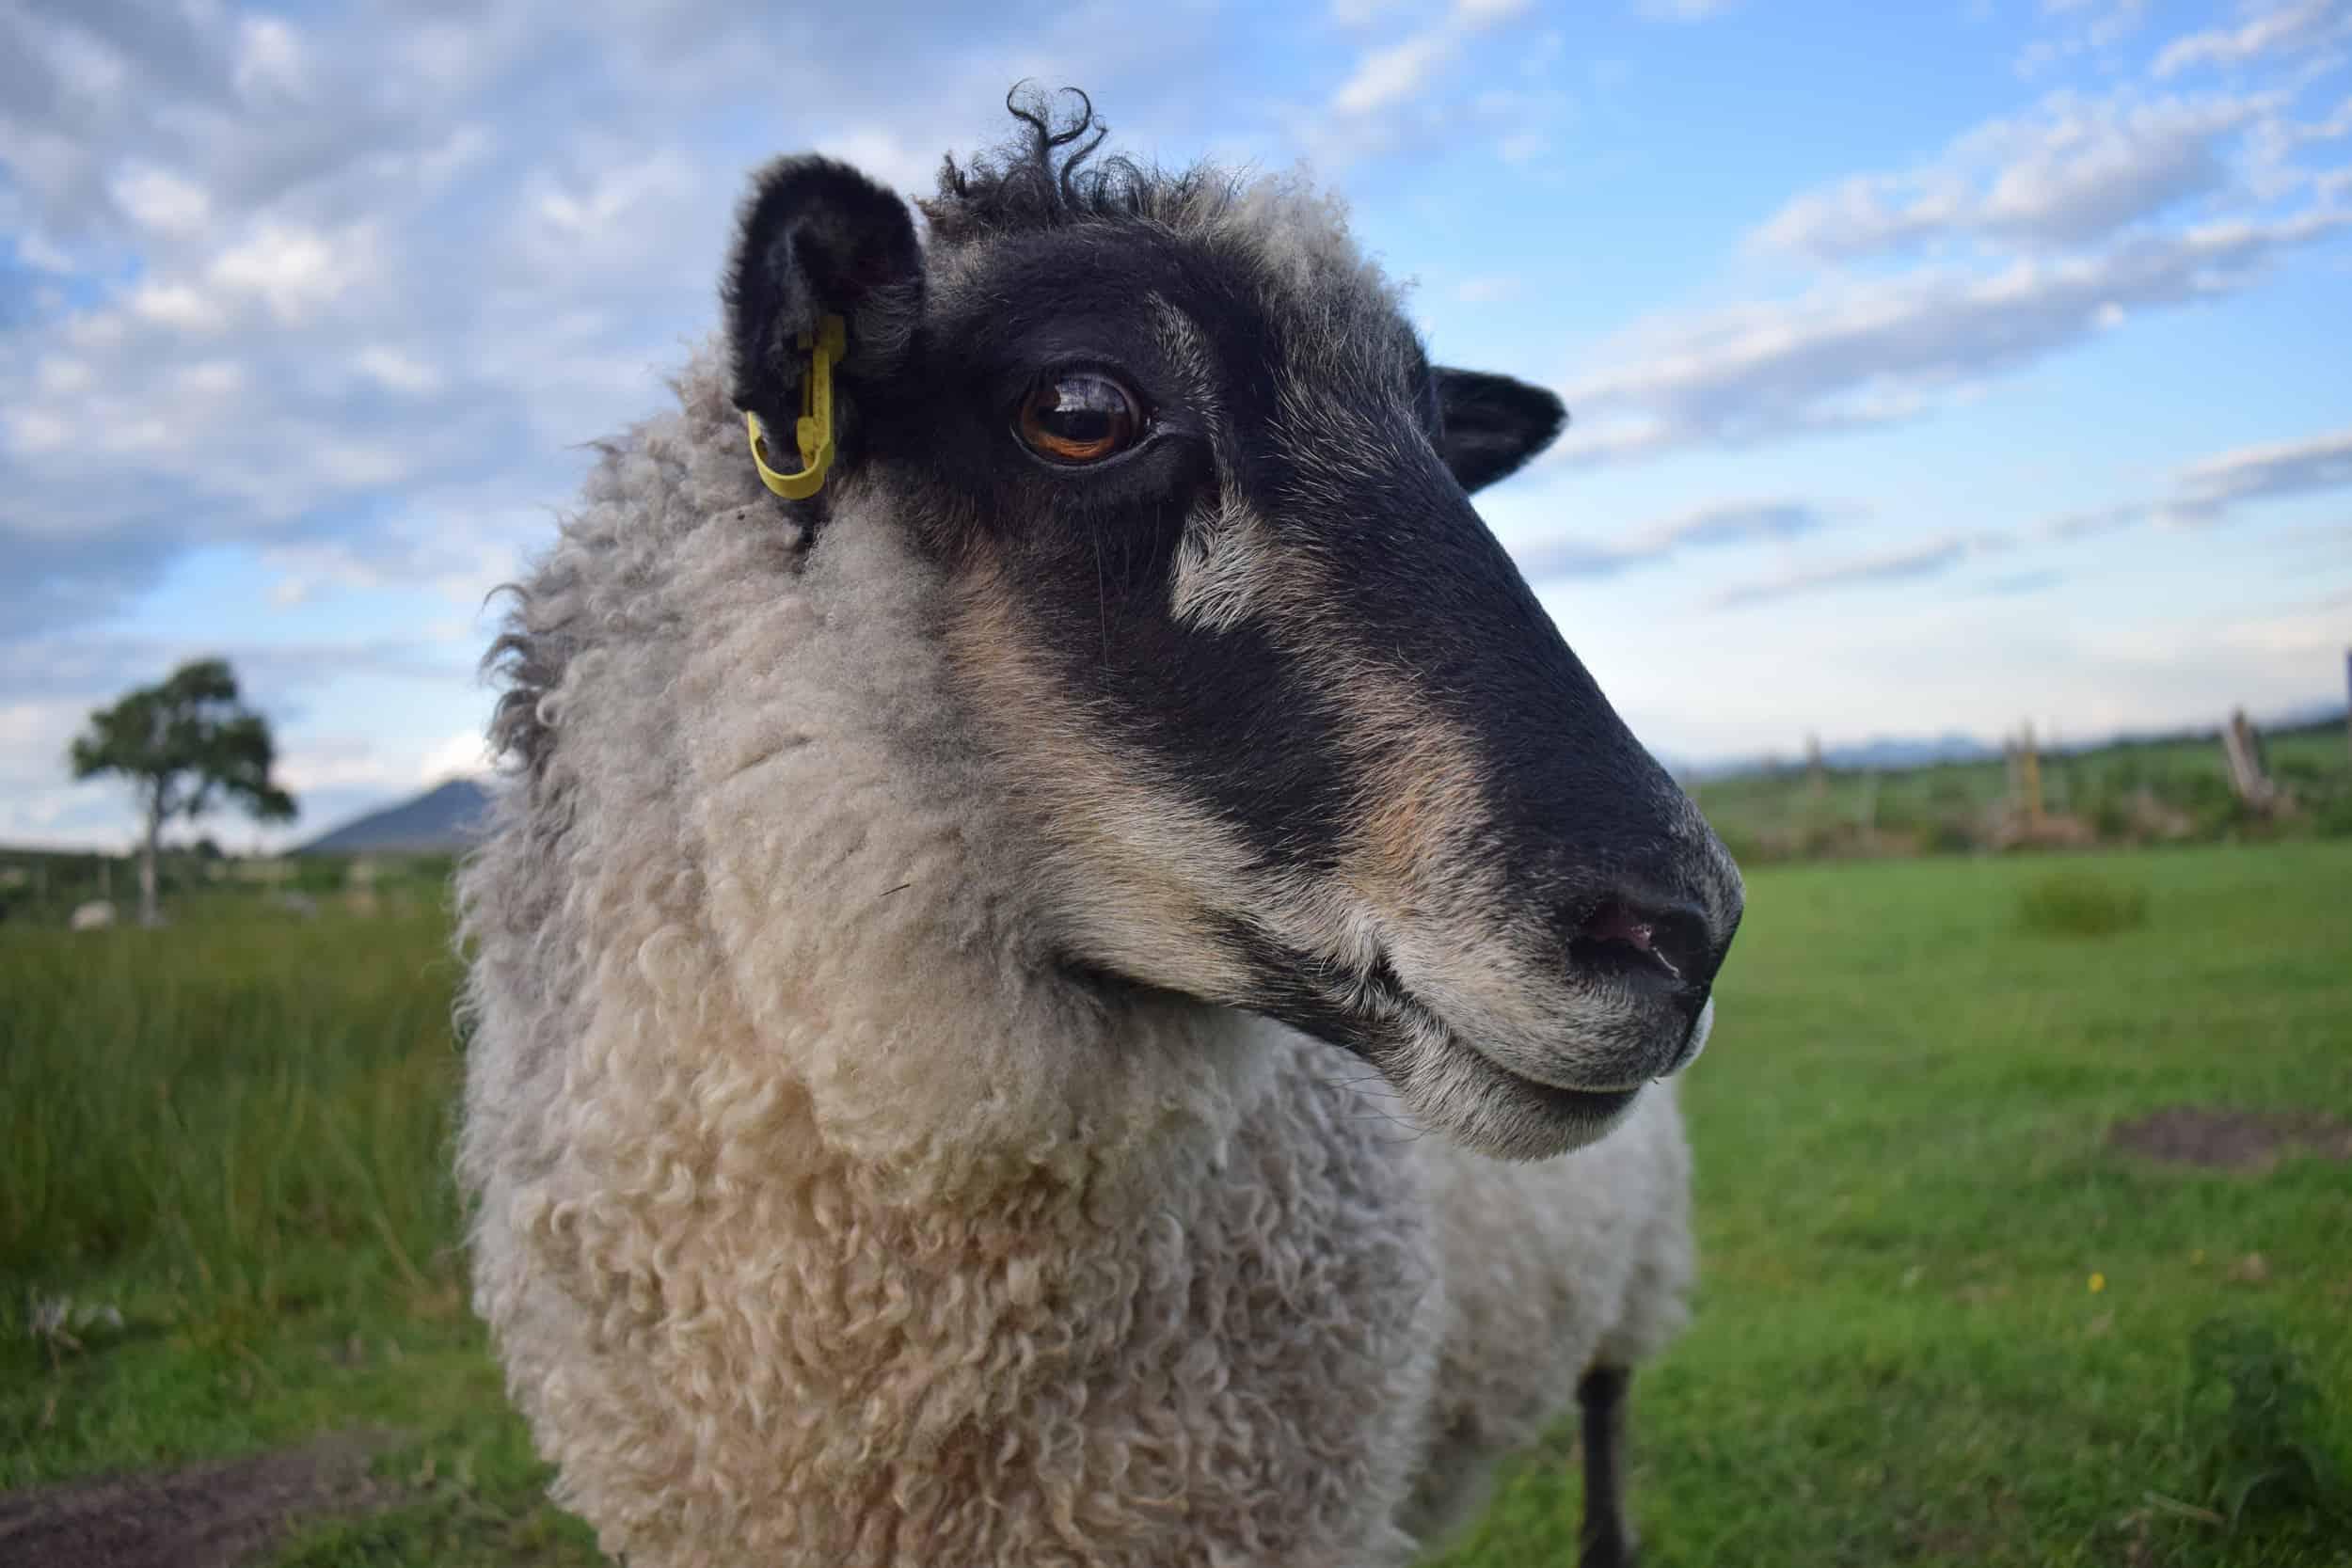 Florence sheep coloured leicester longwool cross gotland shetland shearling ewe felted fleece rug